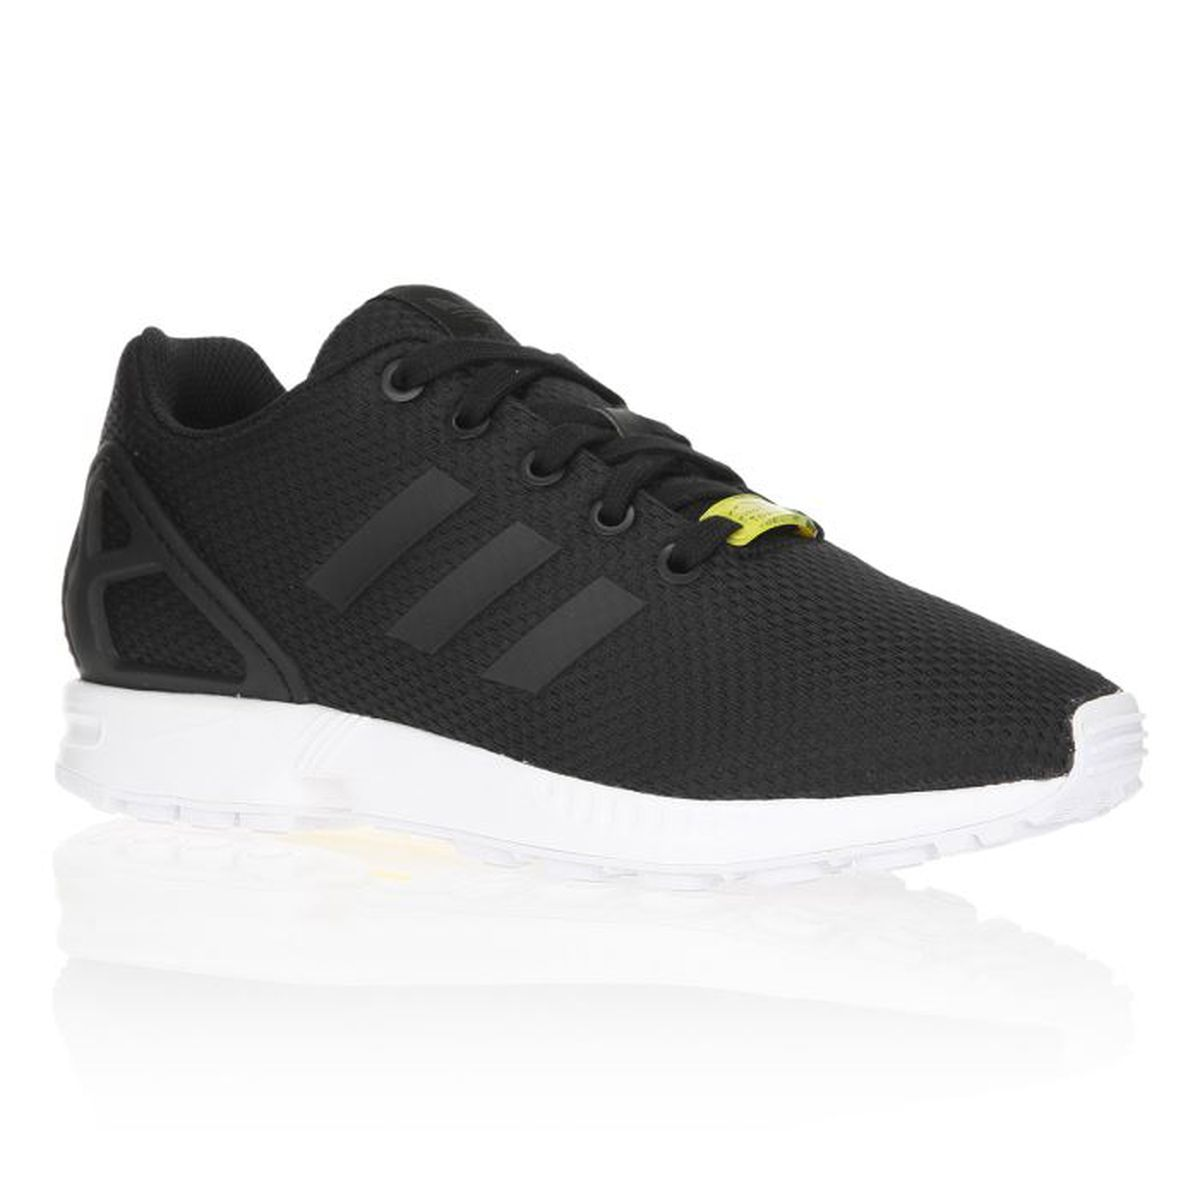 Adidas Original Zx Flux Pas Cher